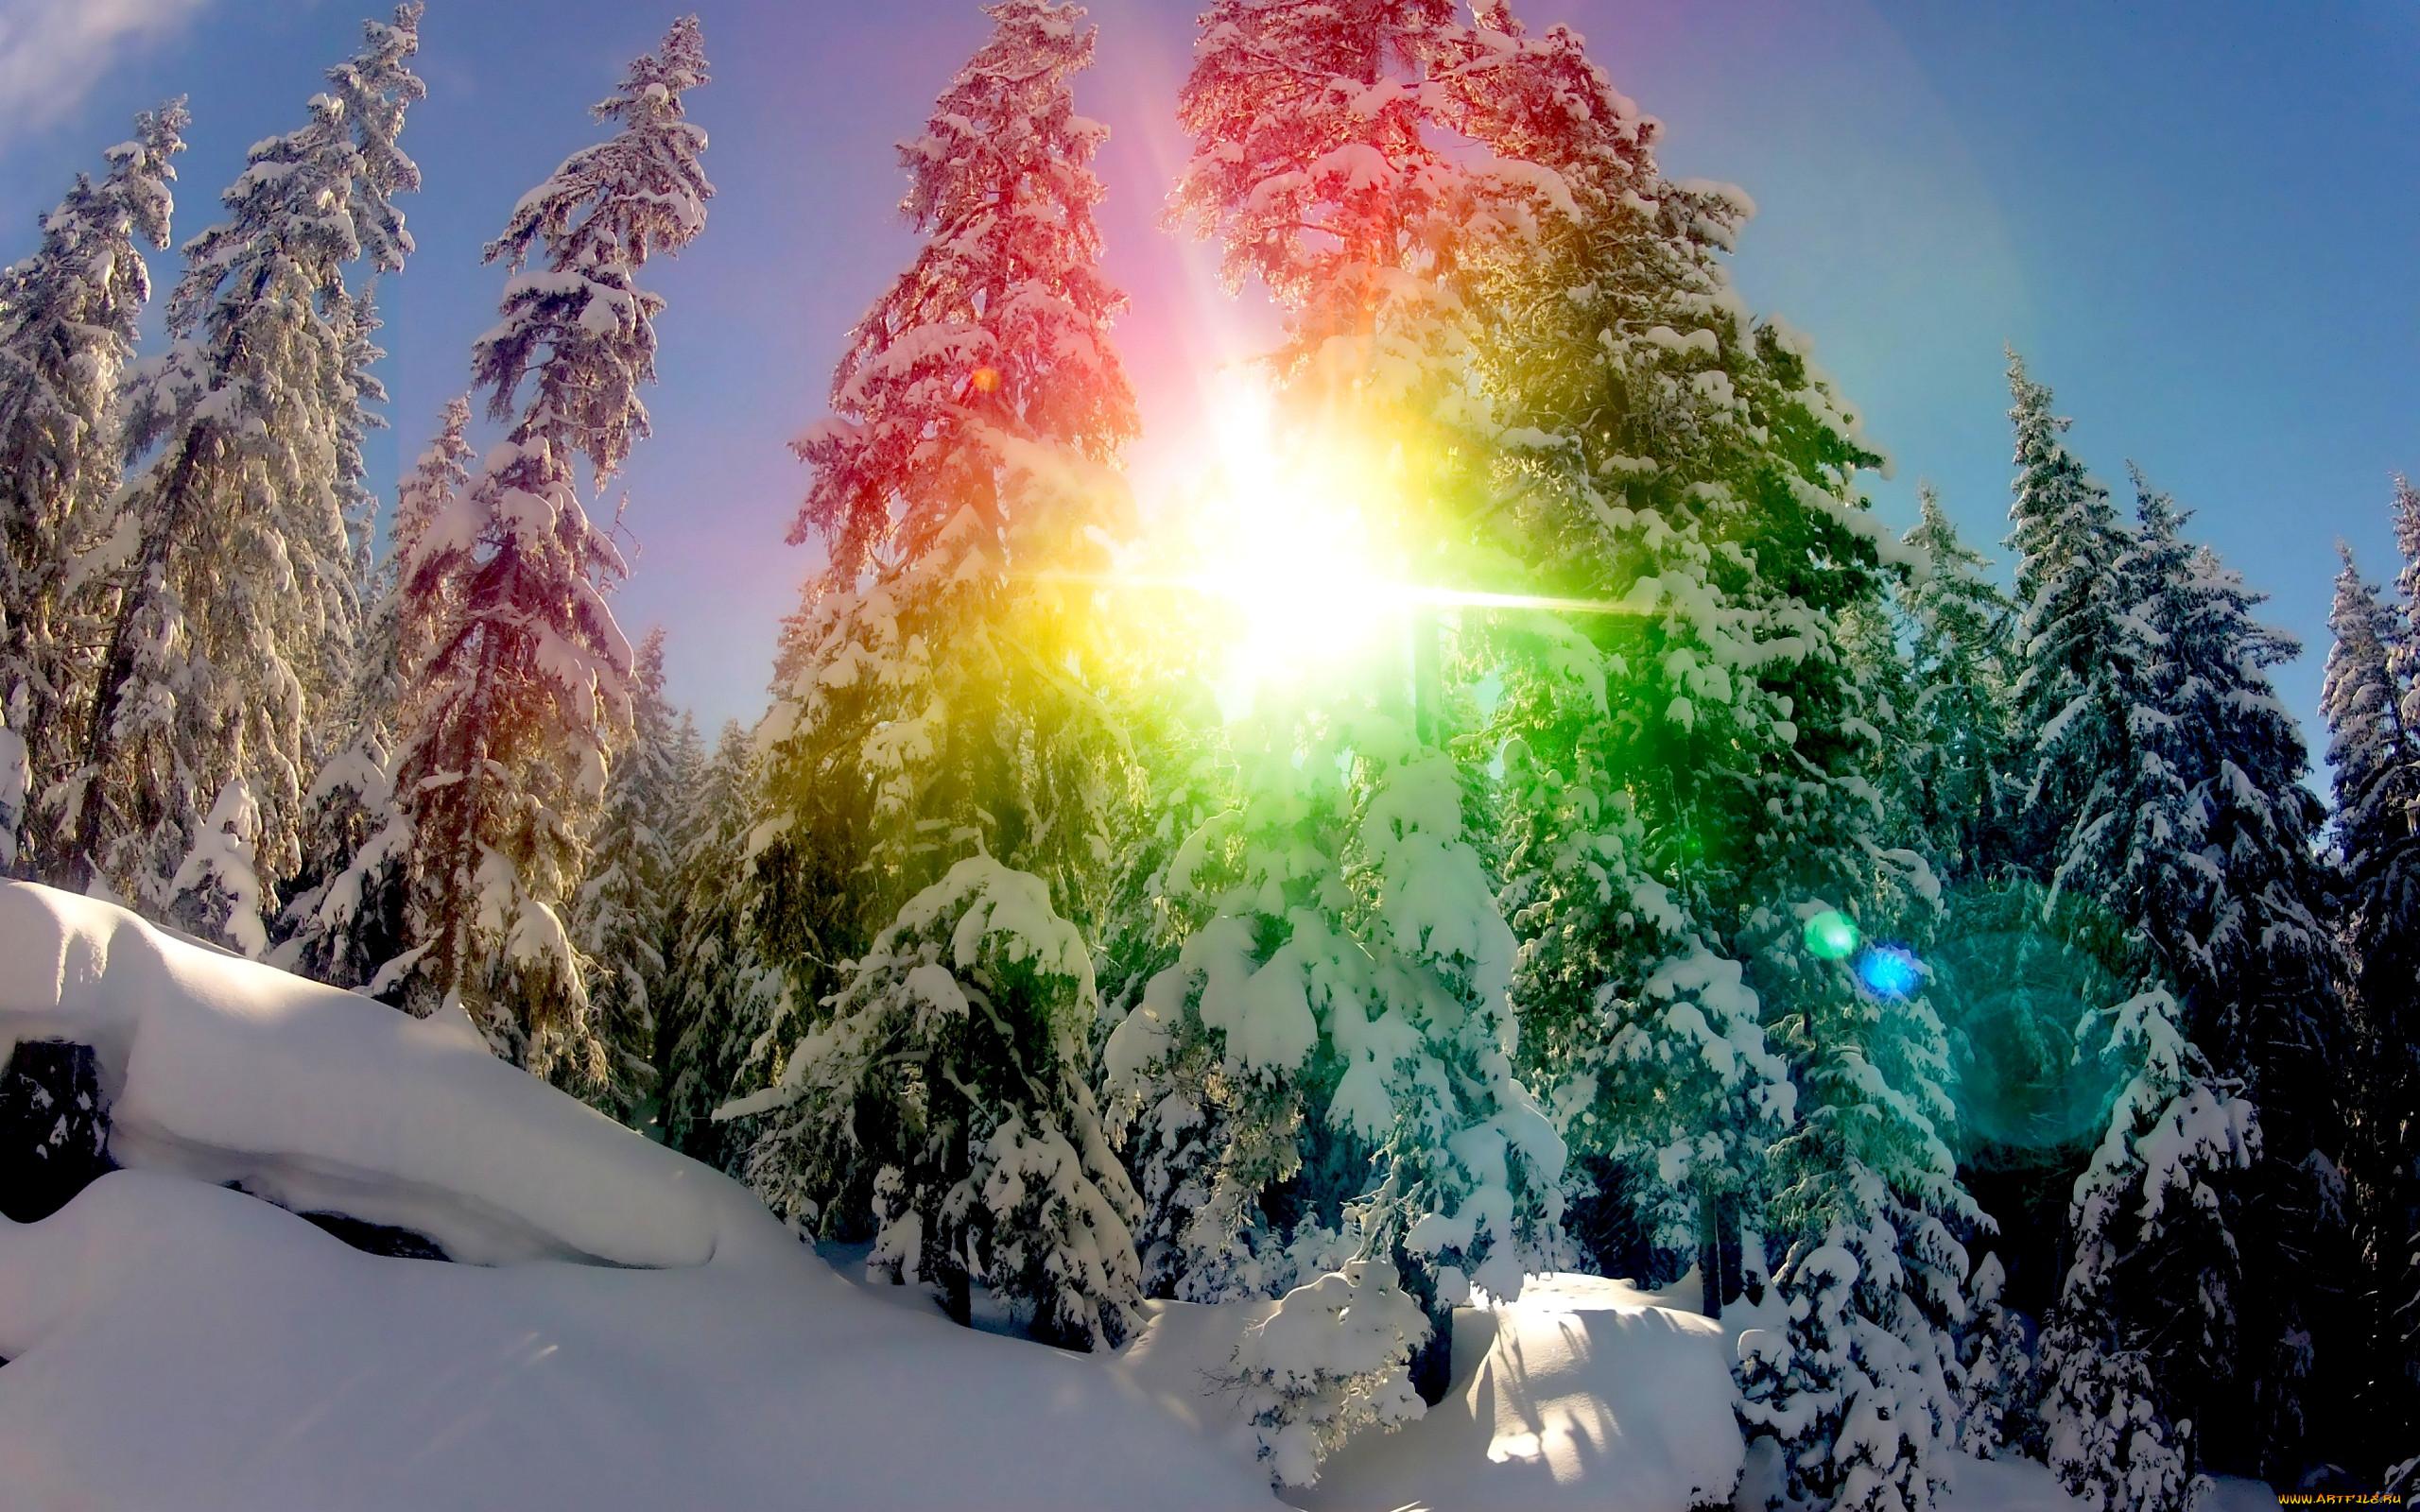 красивые картинки солнца и снега группе